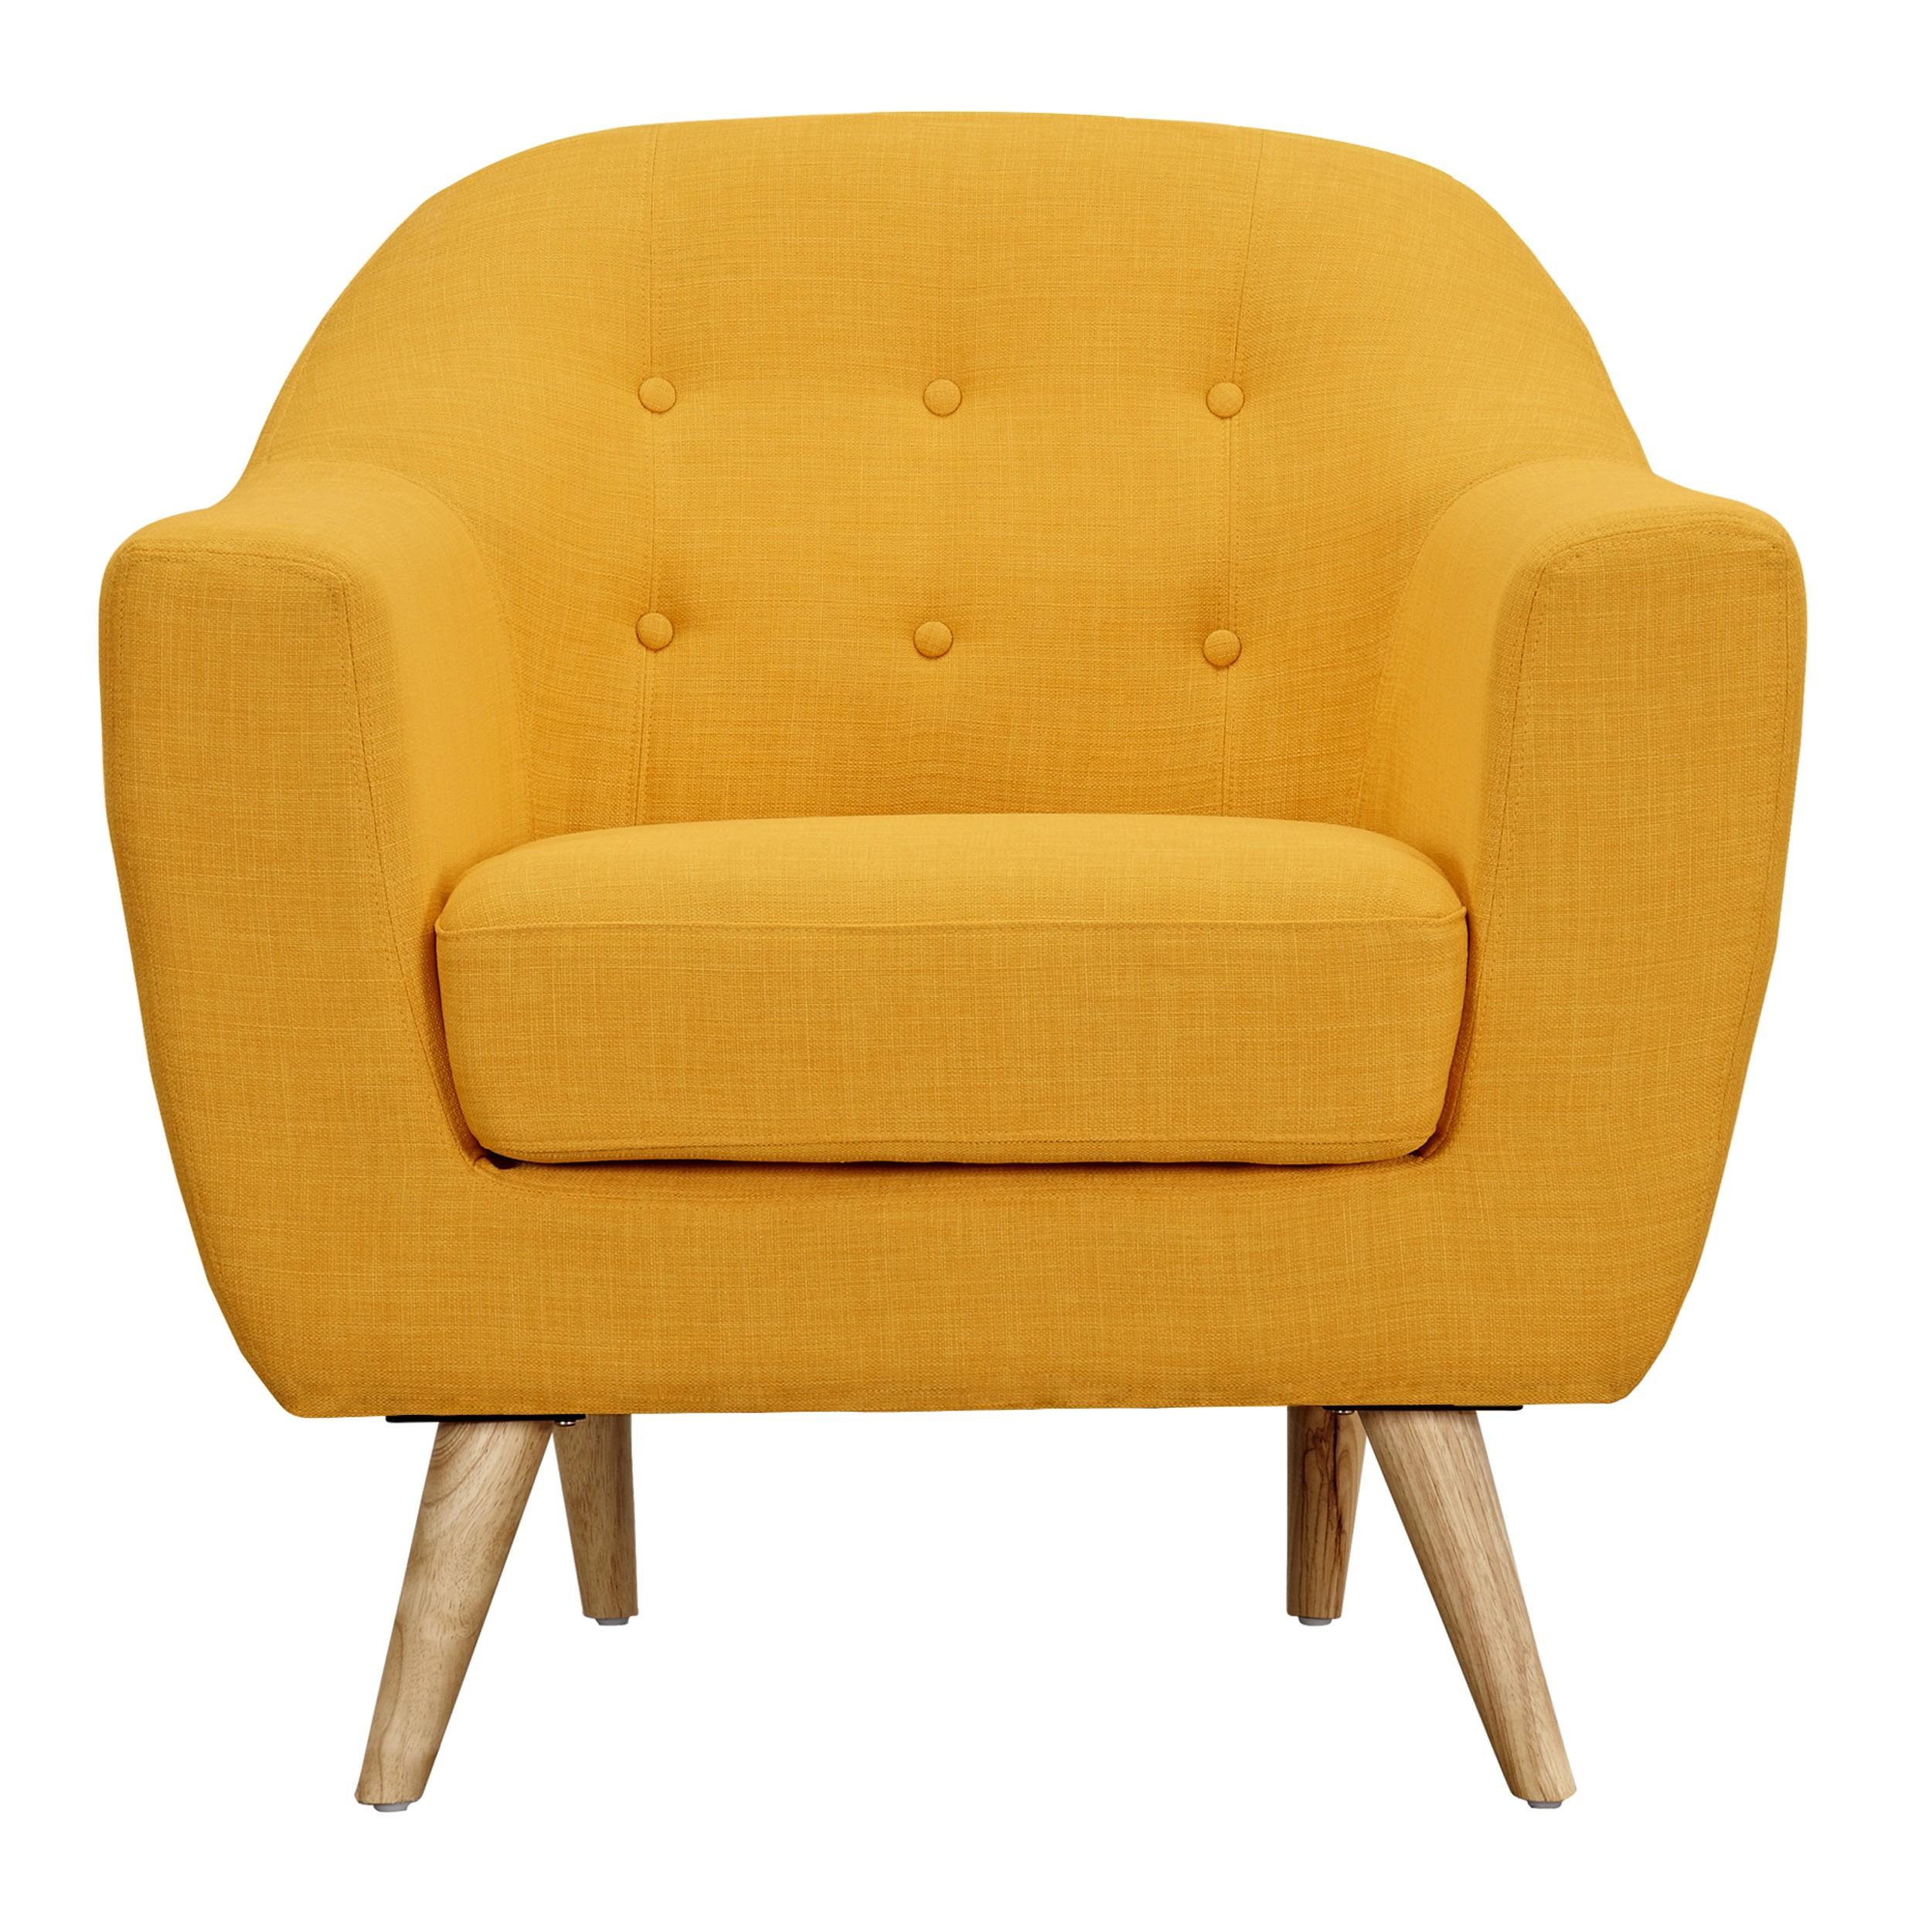 acheter fauteuil jaune confort - Fauteuil Jaune Scandinave